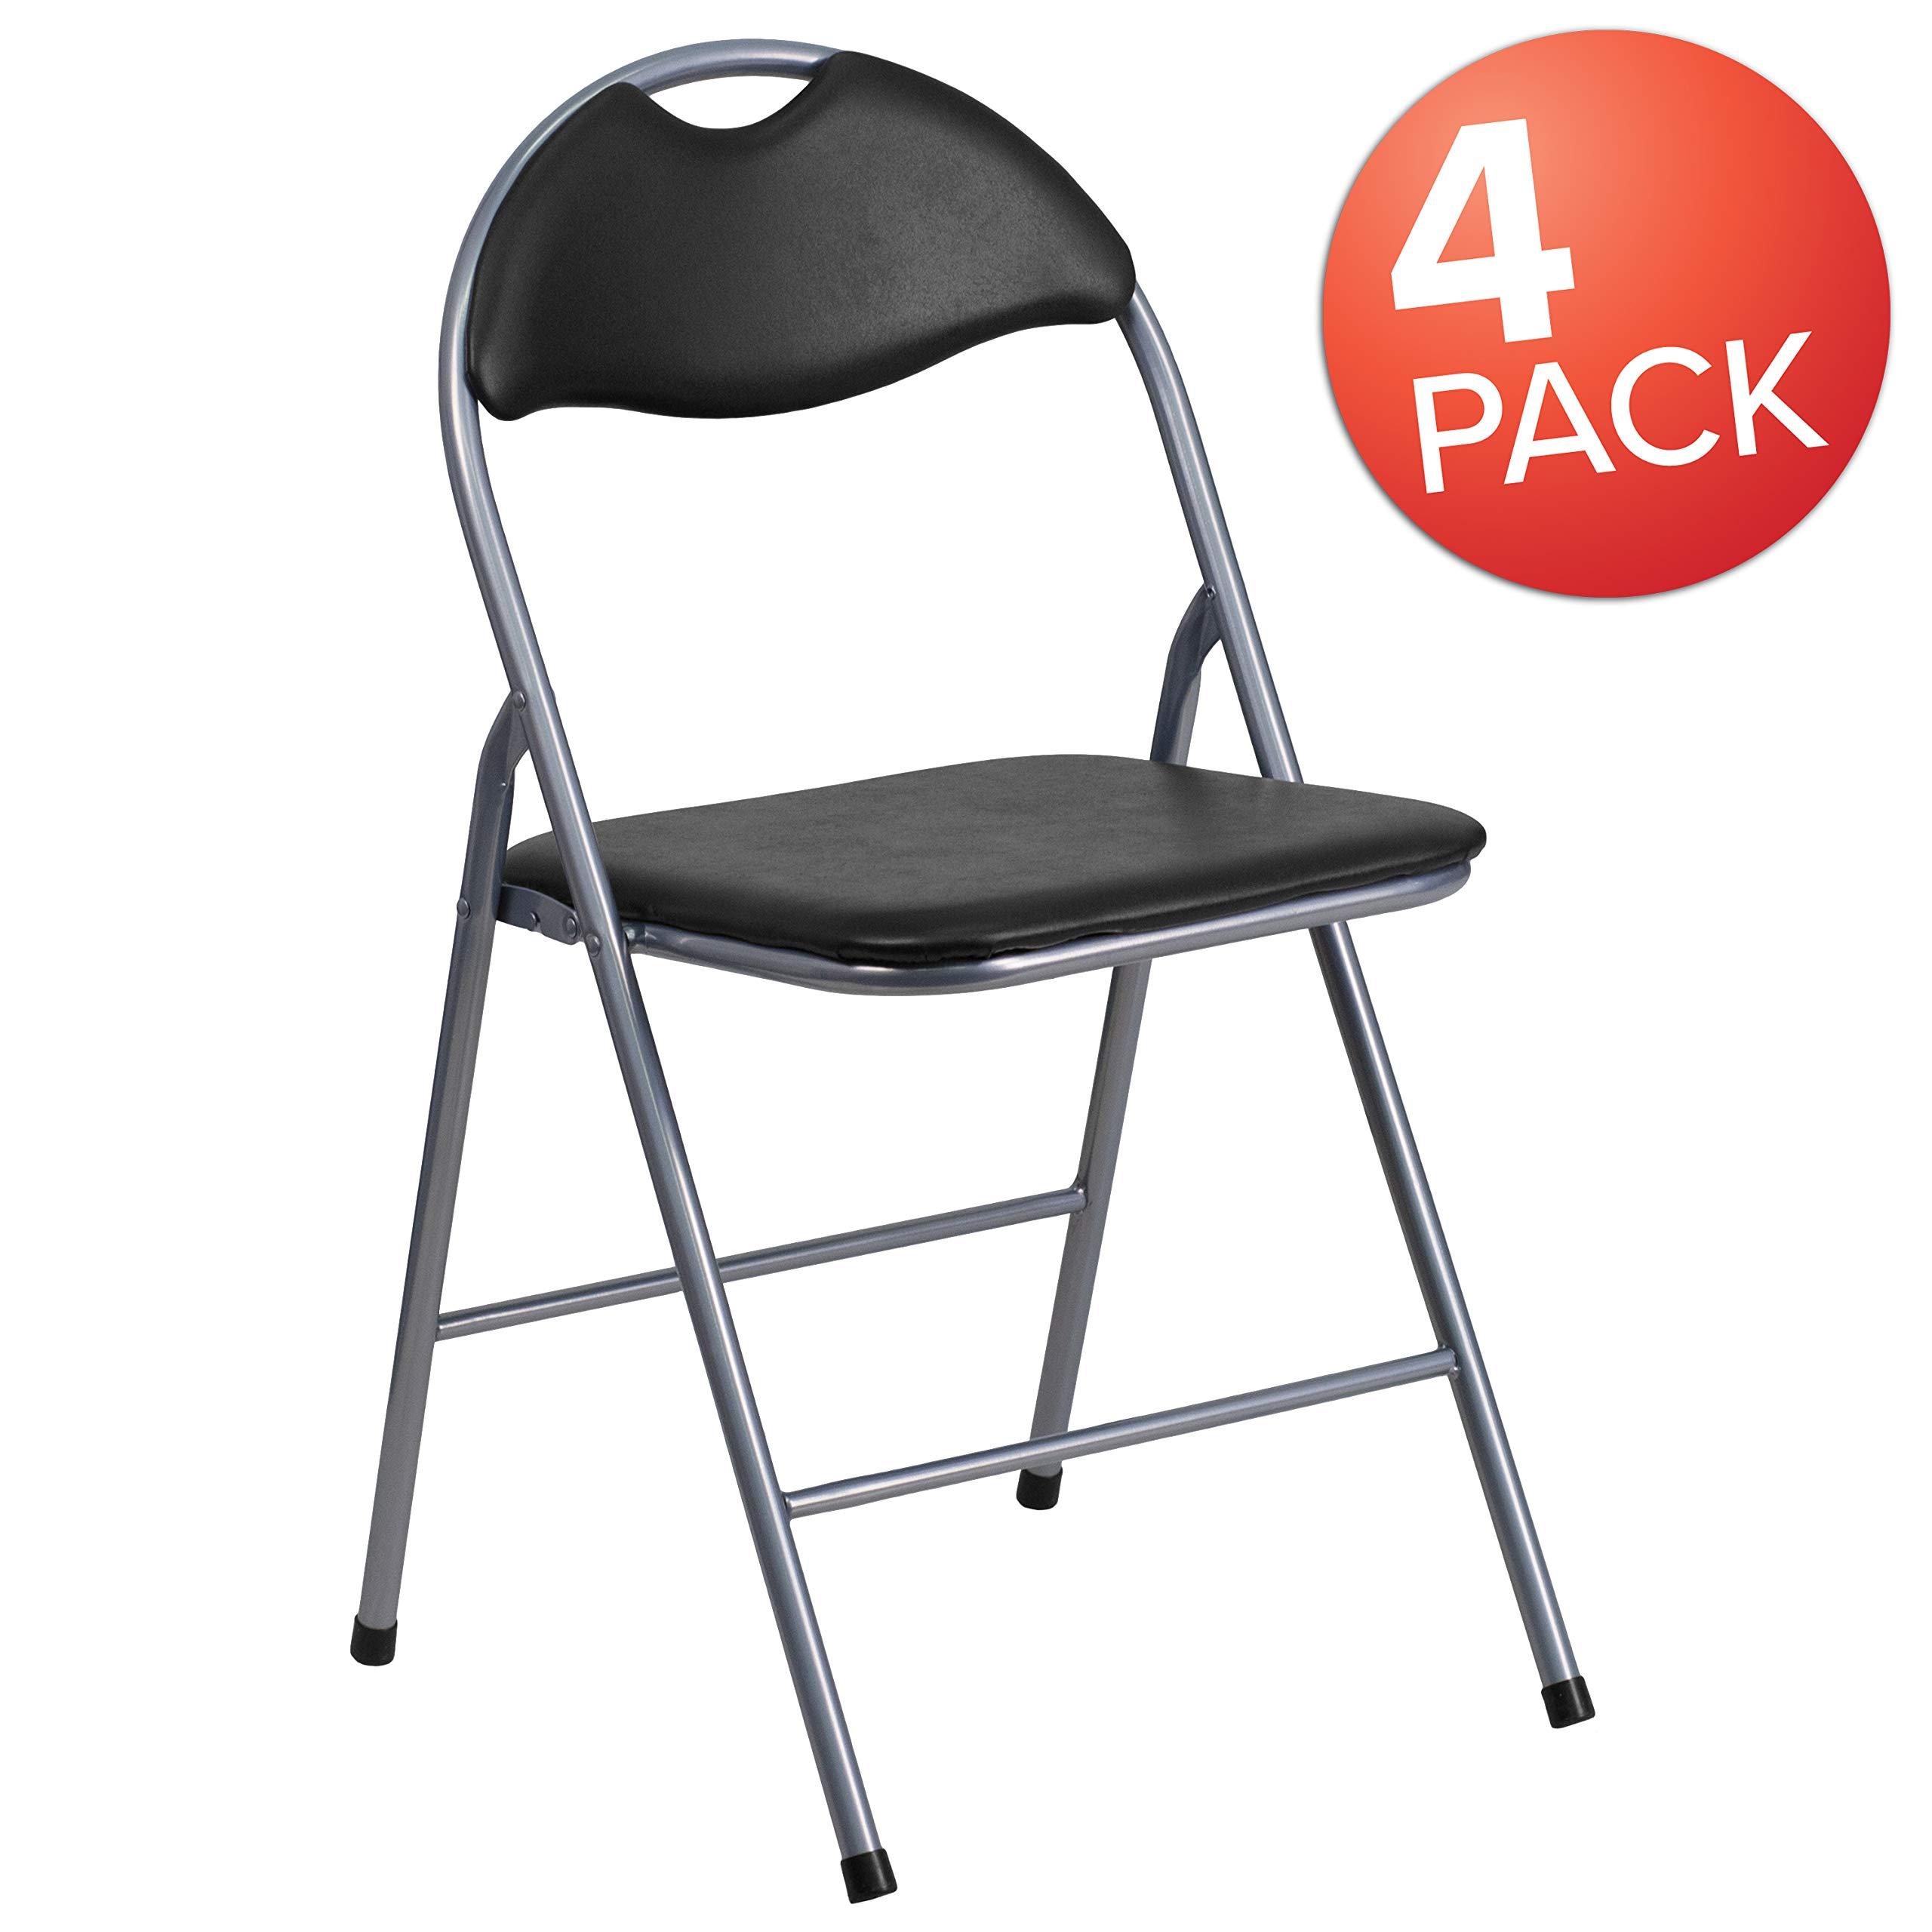 Flash Furniture 4 Pk. HERCULES Series Black Vinyl Metal Folding Chair with Carrying Handle by Flash Furniture